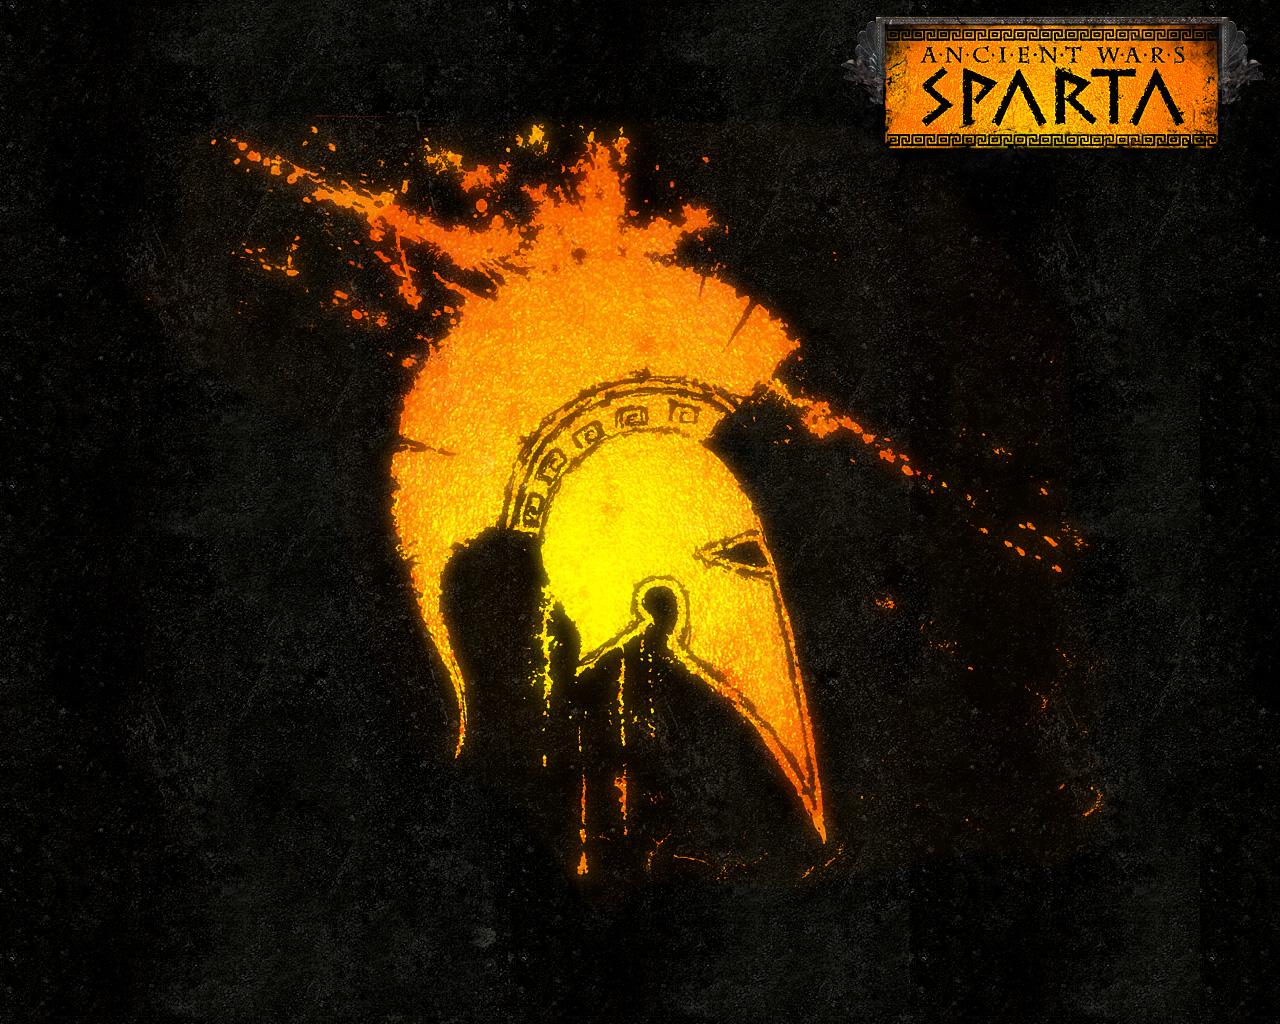 Images Of Spartan Race Wallpaper Hd Spacehero